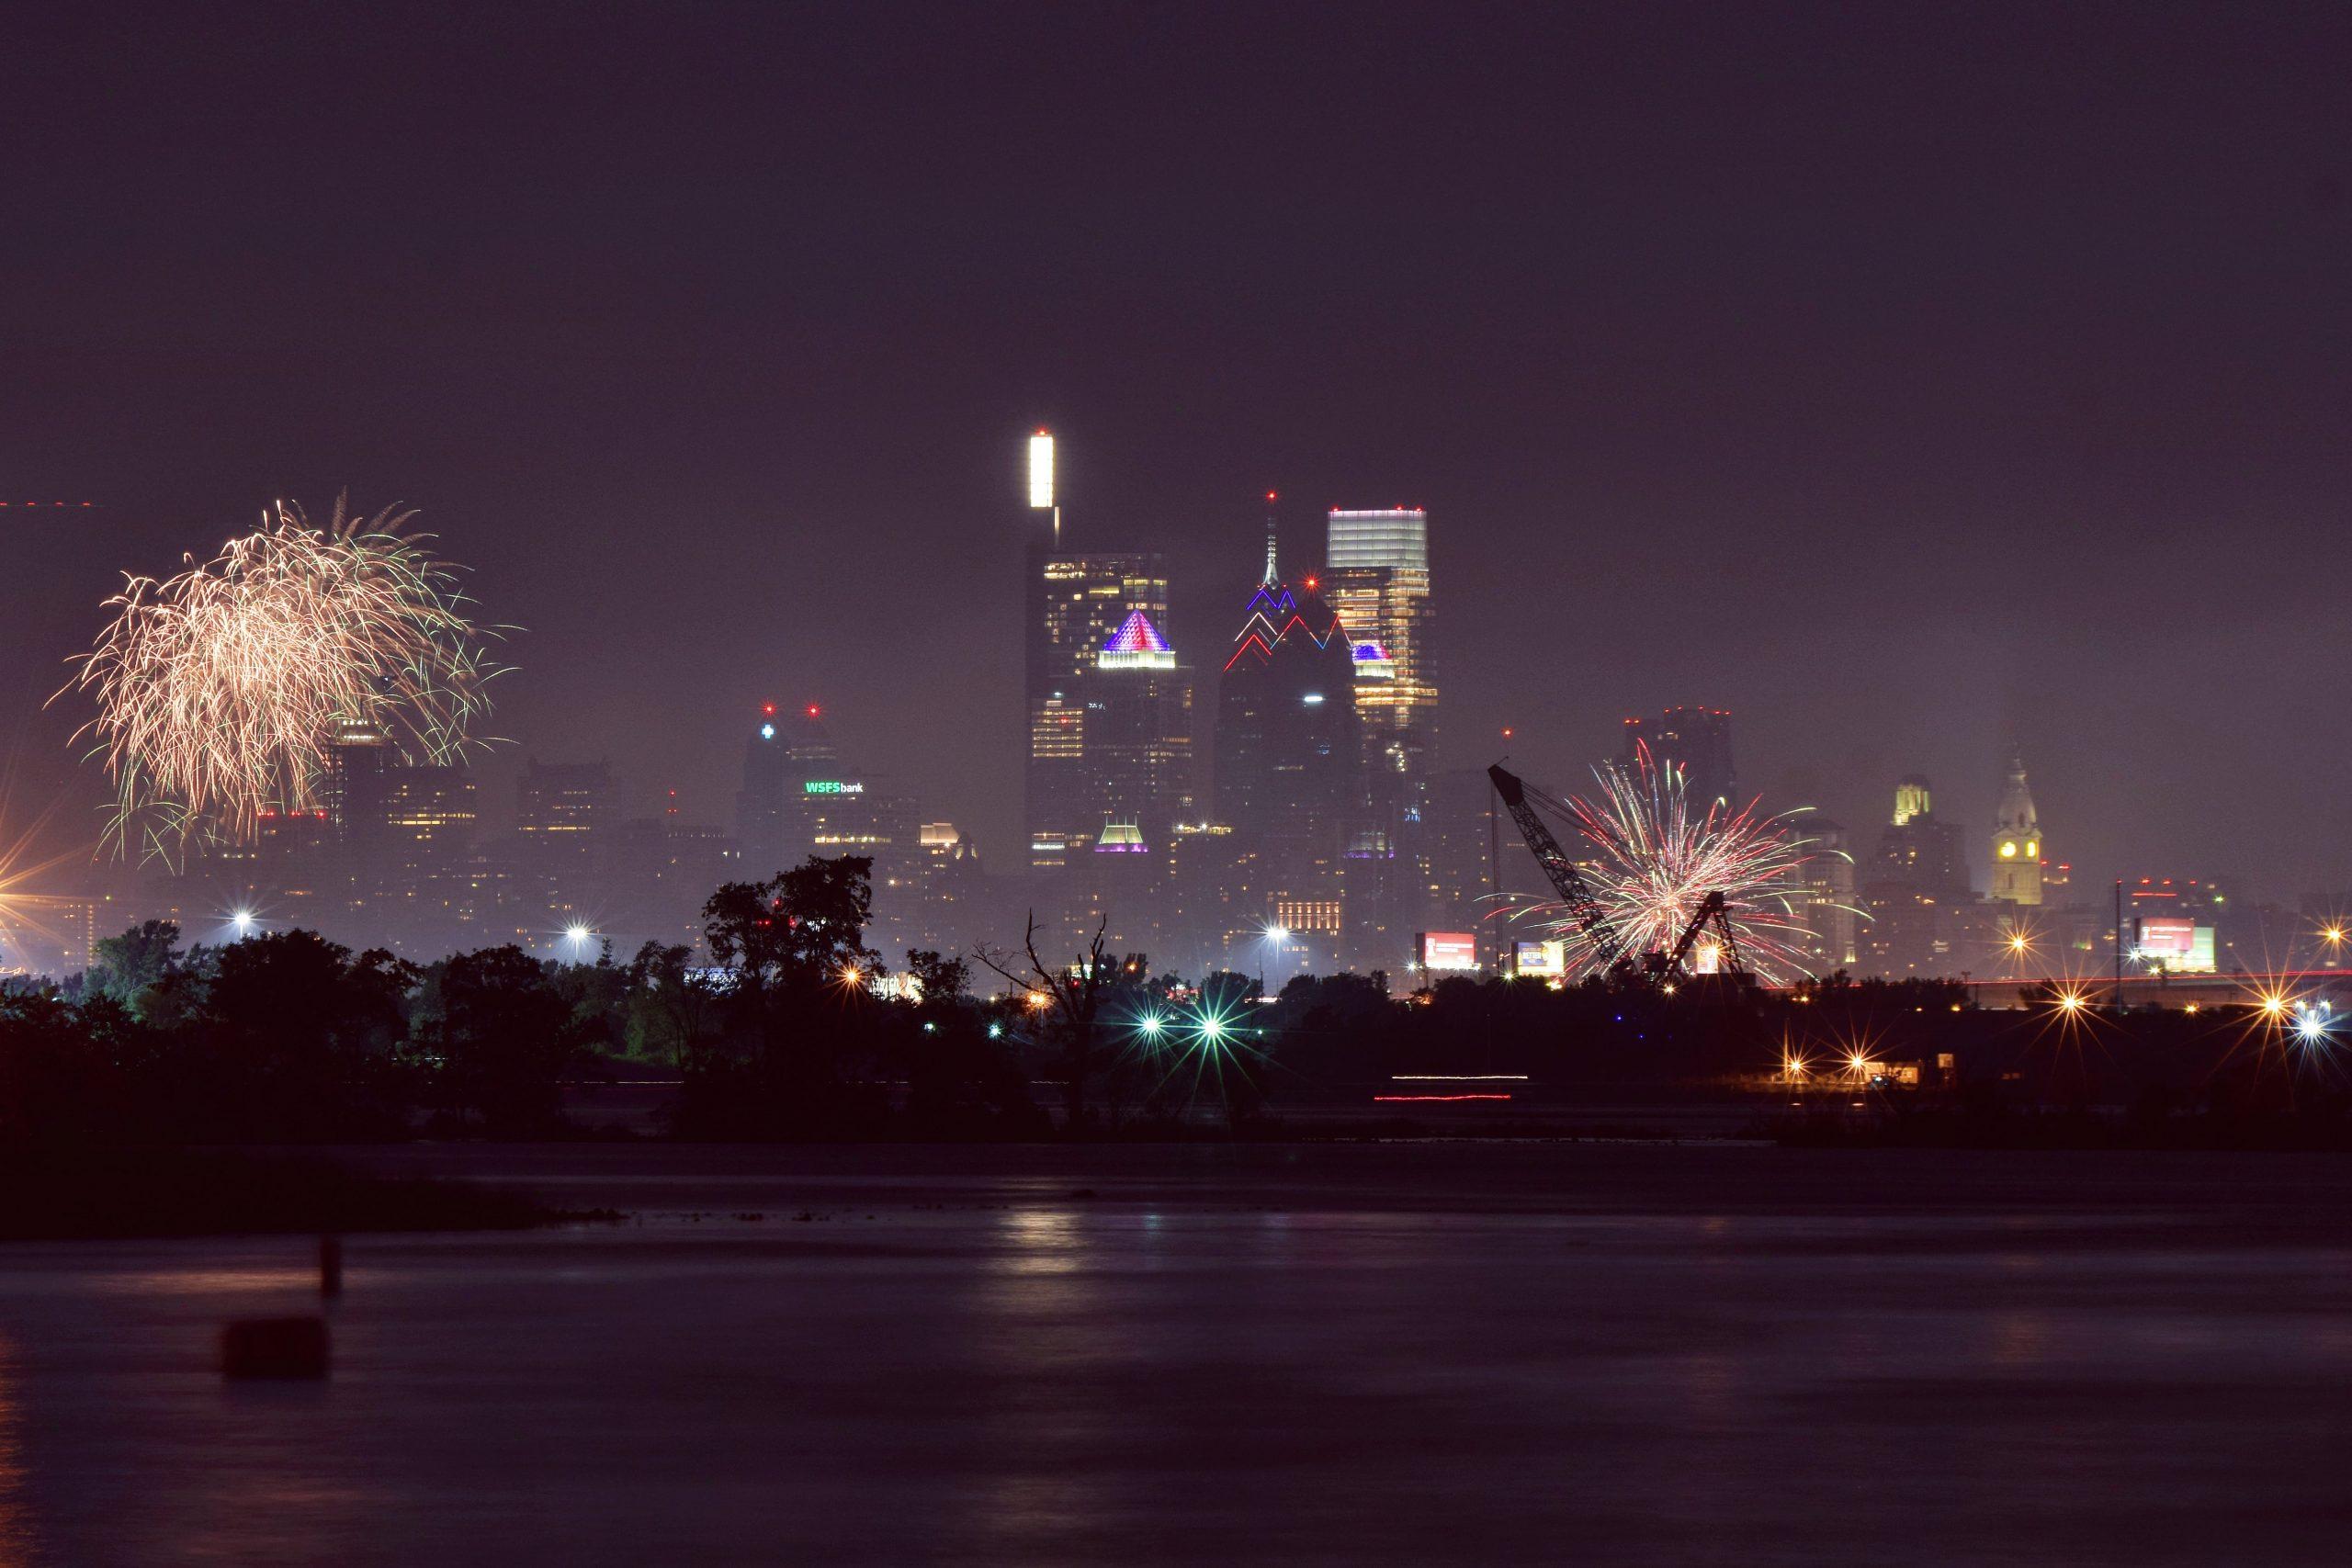 Wawa Welcome America fireworks and the Philadelphia skyline from New Jersey. Photo by Thomas Koloski